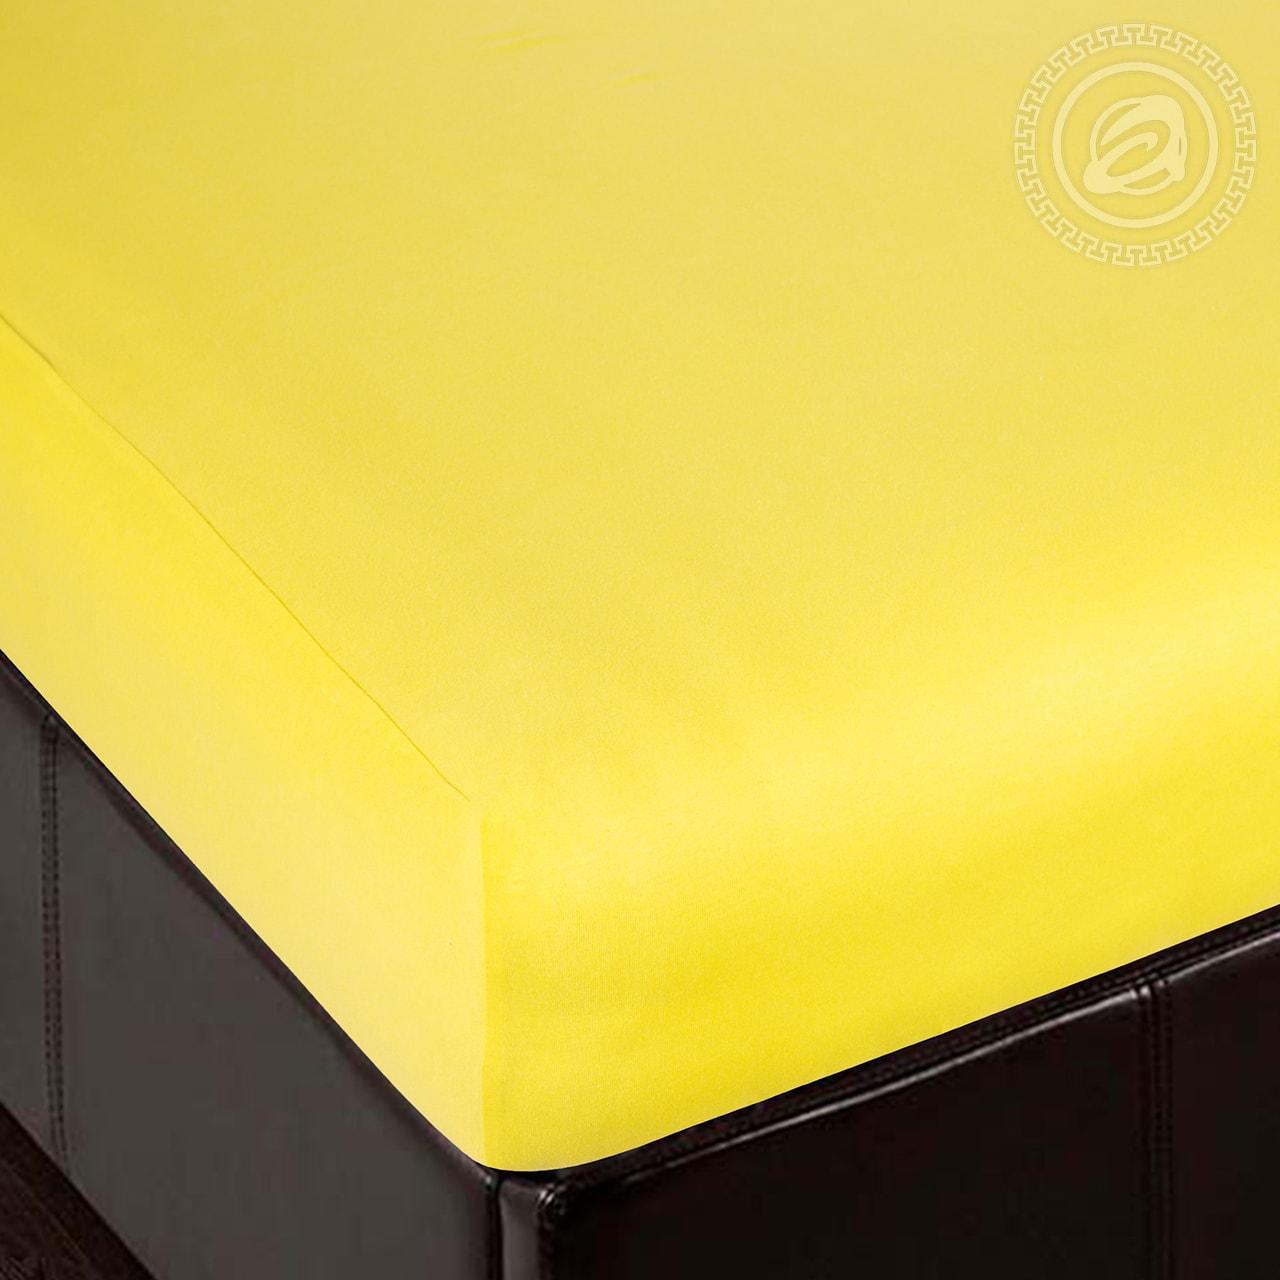 Простыня на резинке Лимон (трикотаж) (60х120) простыня на резинке ирис размер 60х120 см